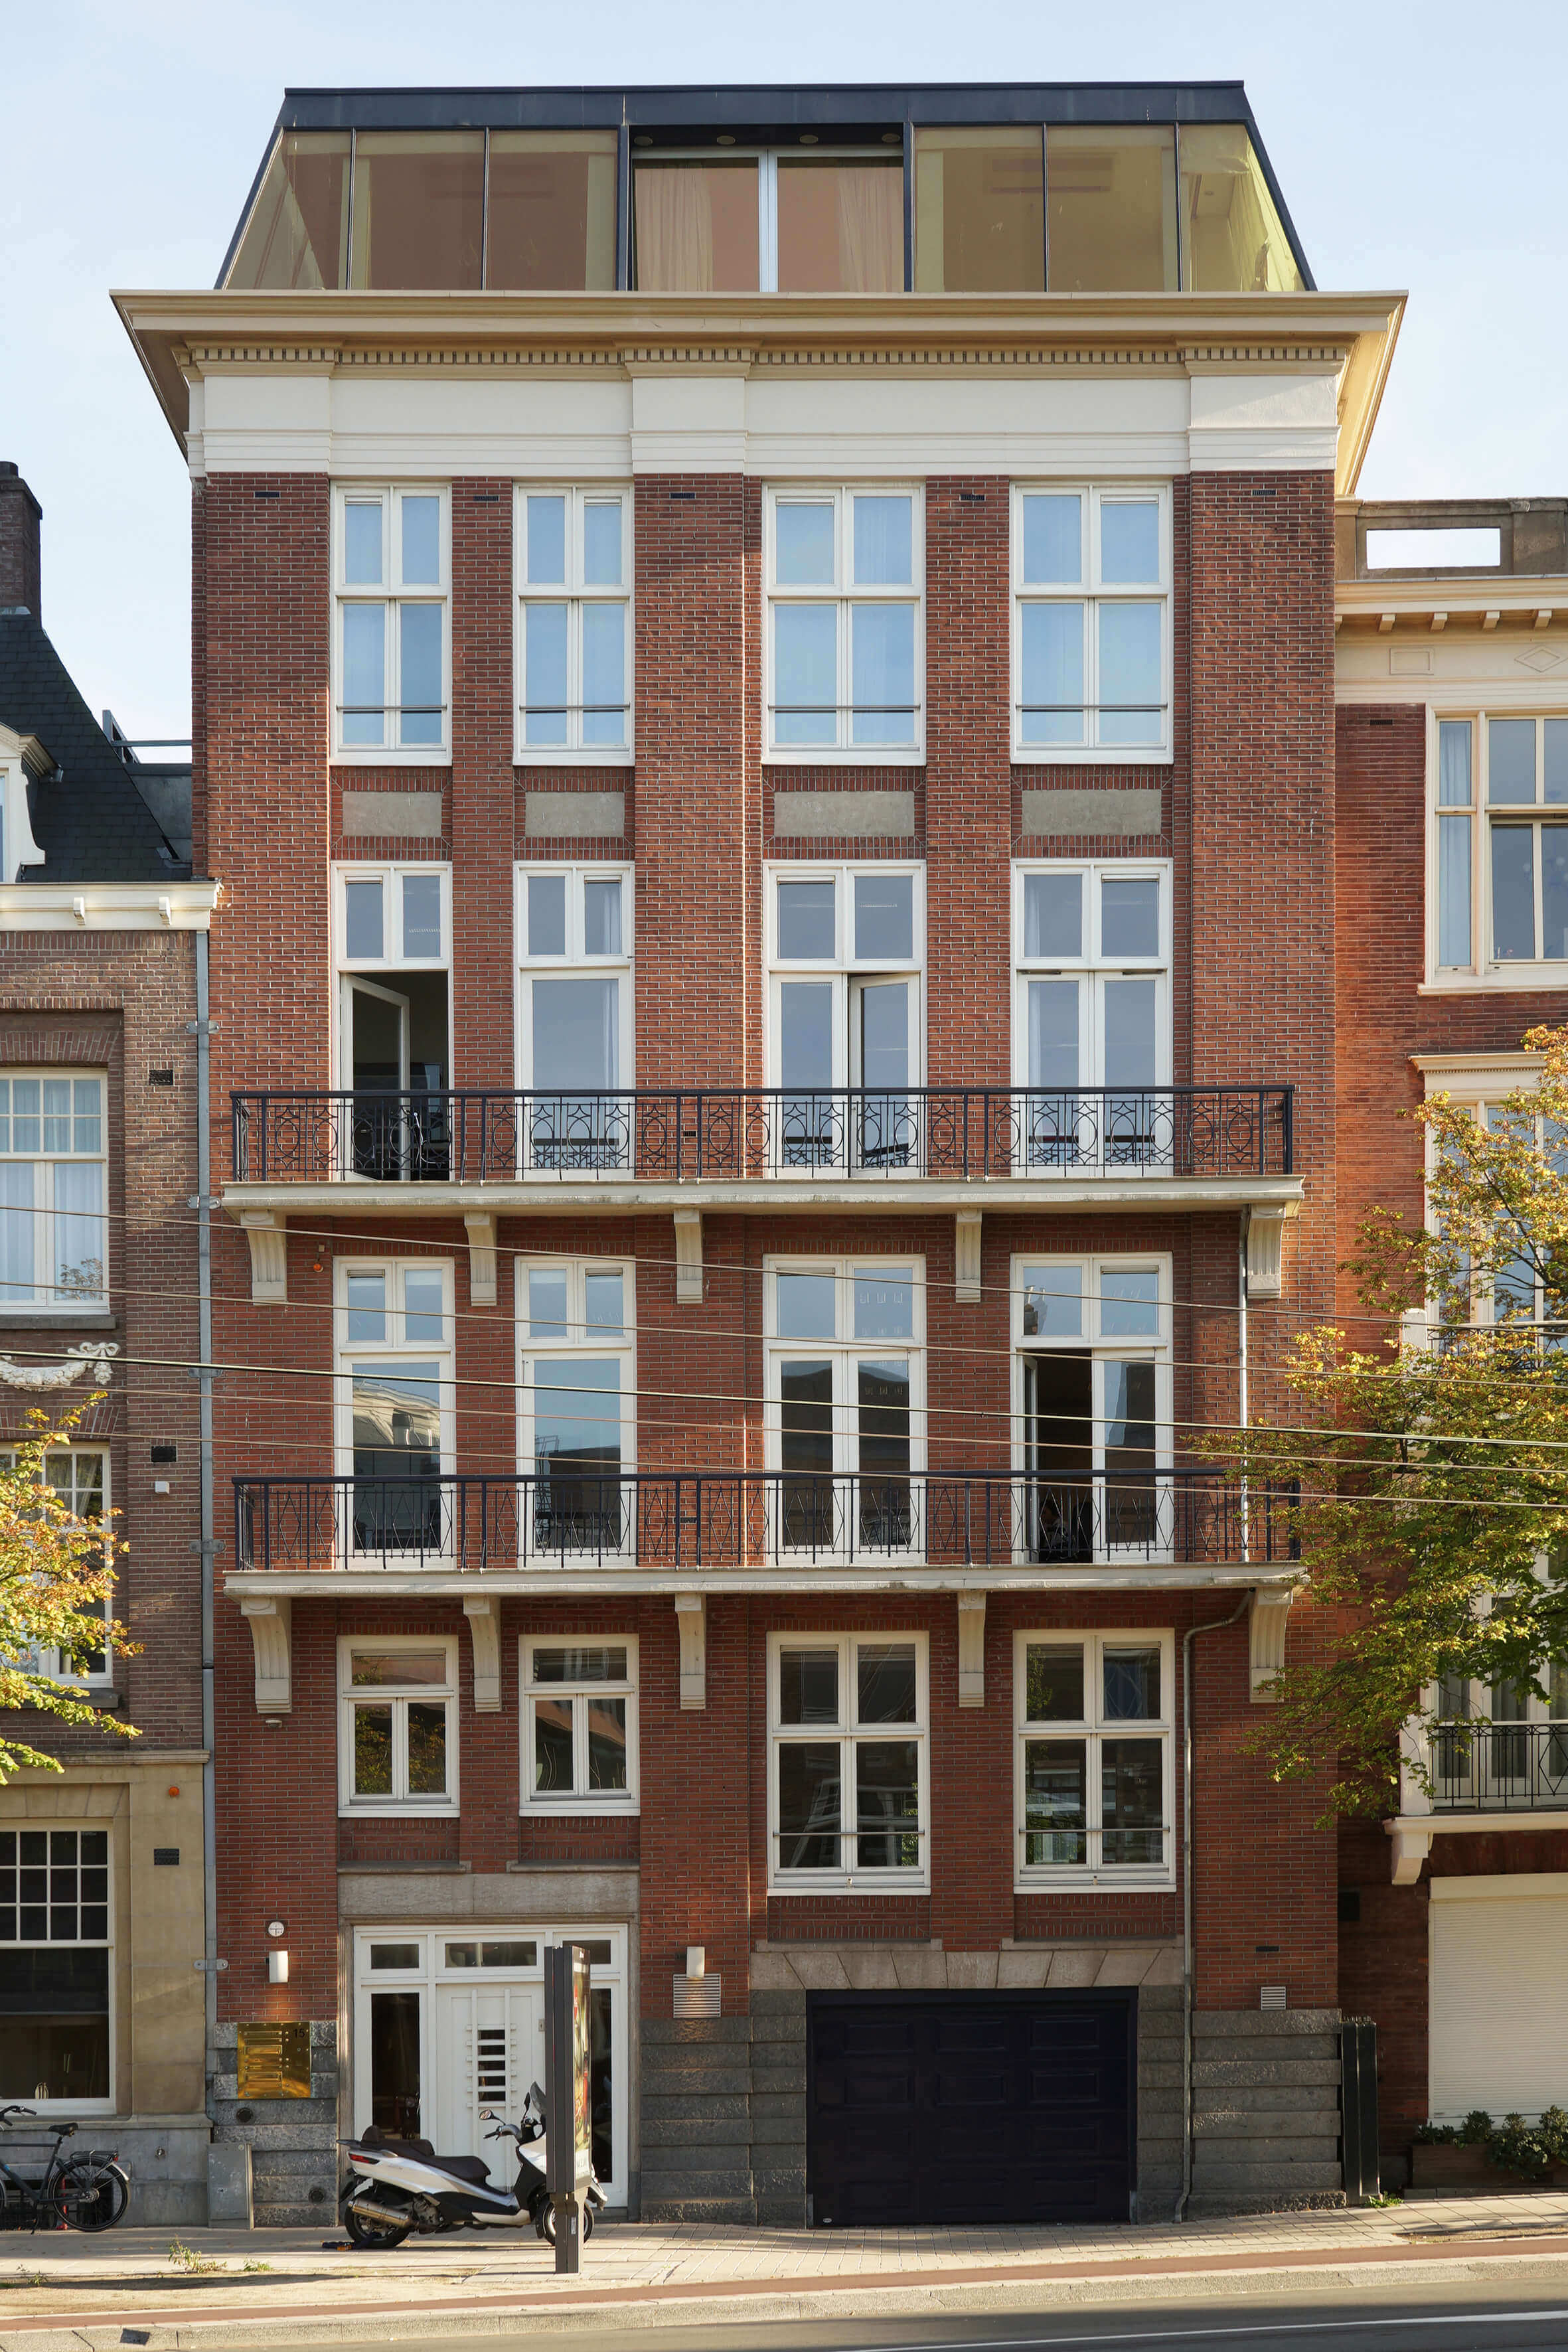 Chestnut Corporate Finance Gevestigd Te Amsterdam Den Haag